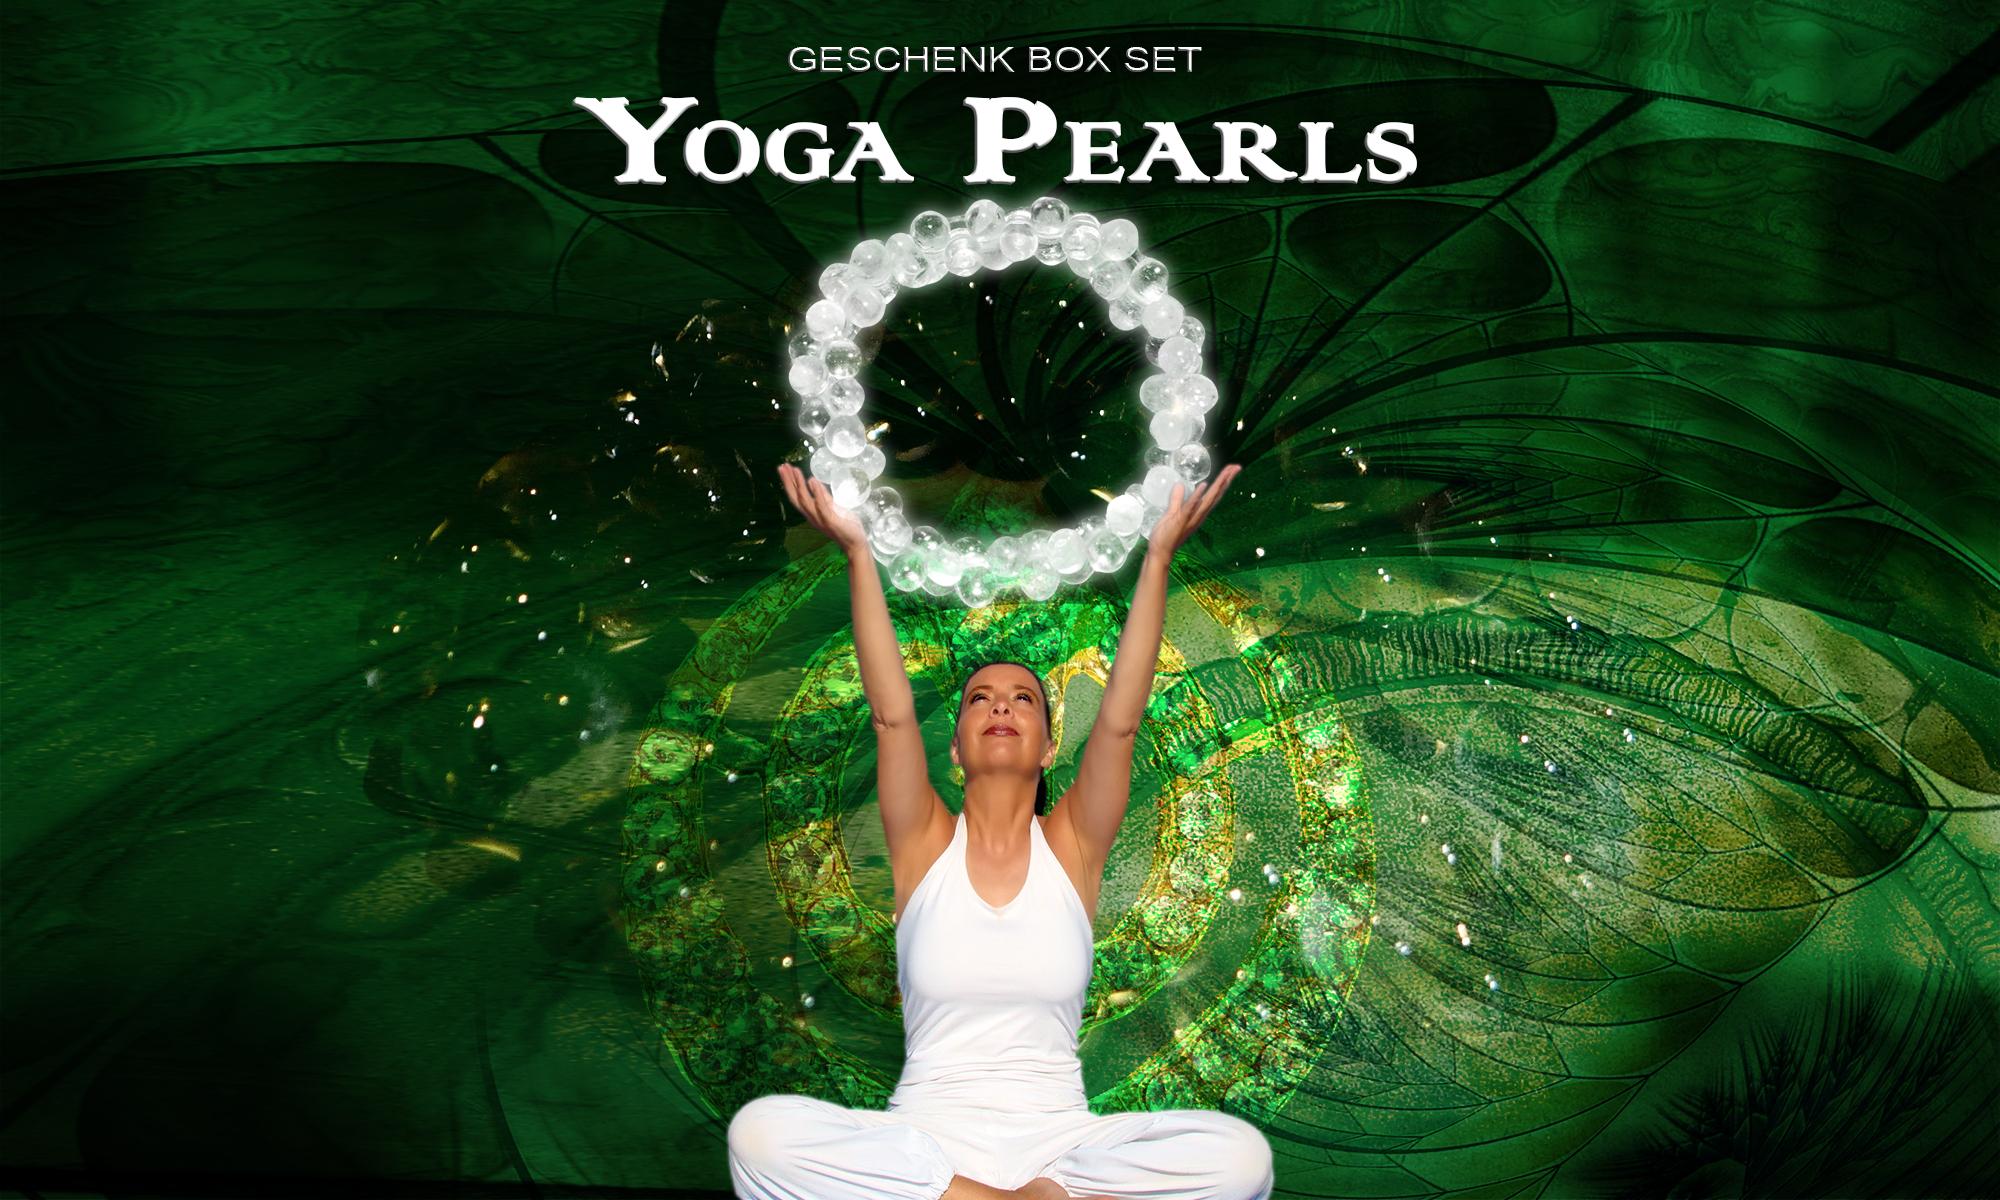 Yoga Pearls Yoga Geschenk Box